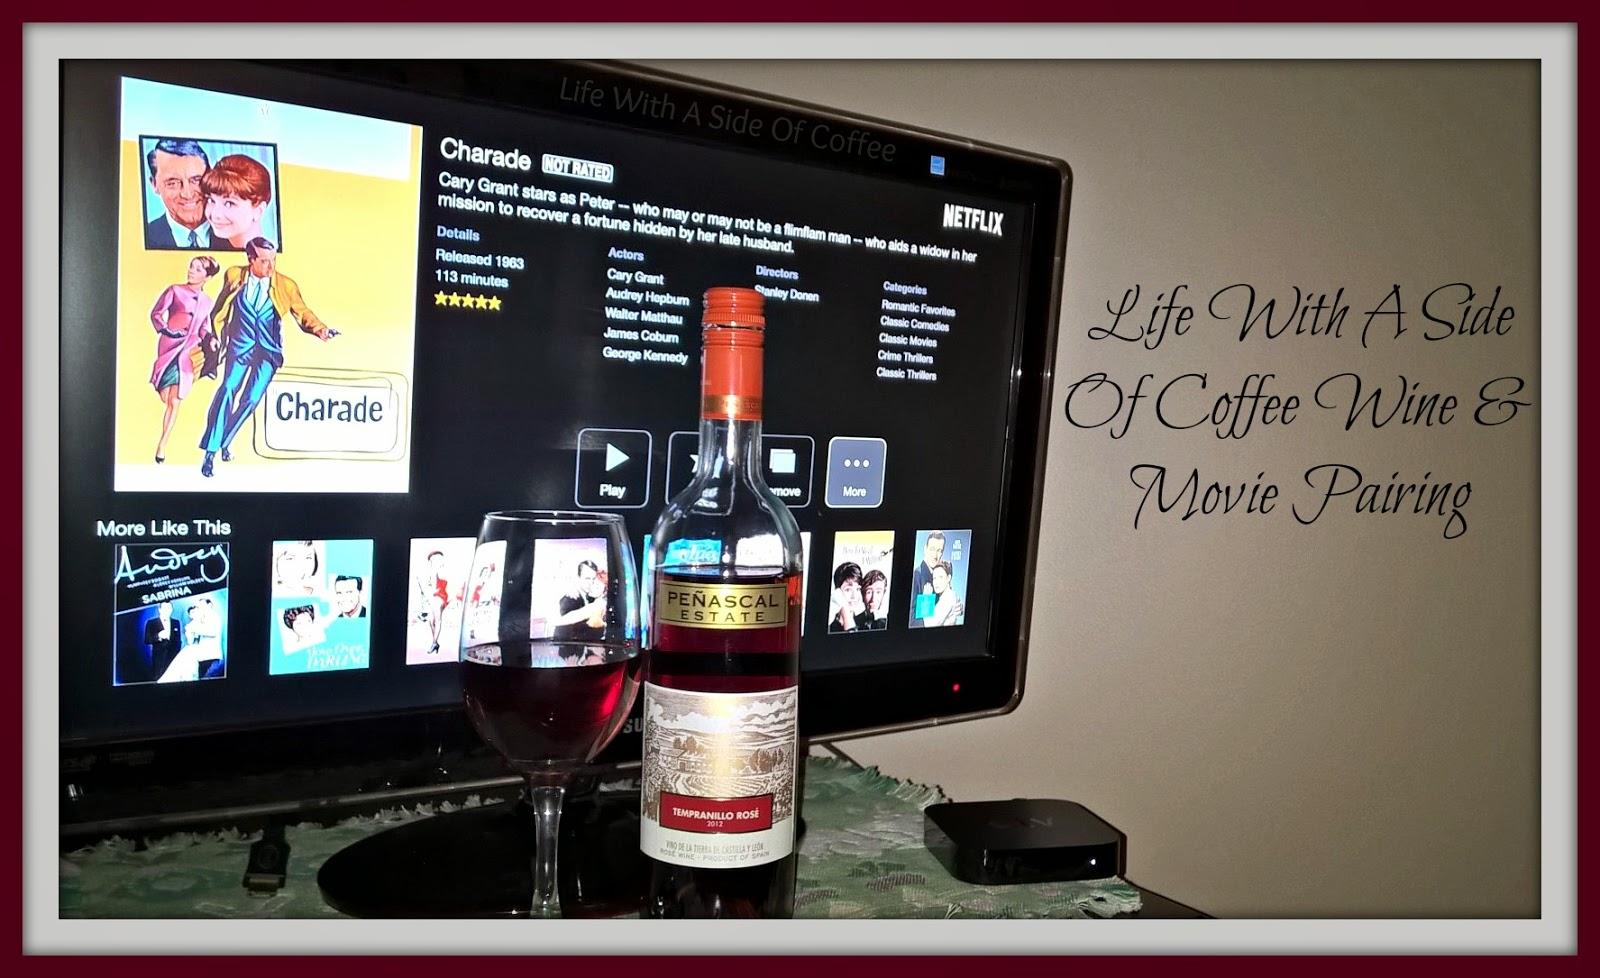 side-of-coffee-wine-and-movie-pairings-11